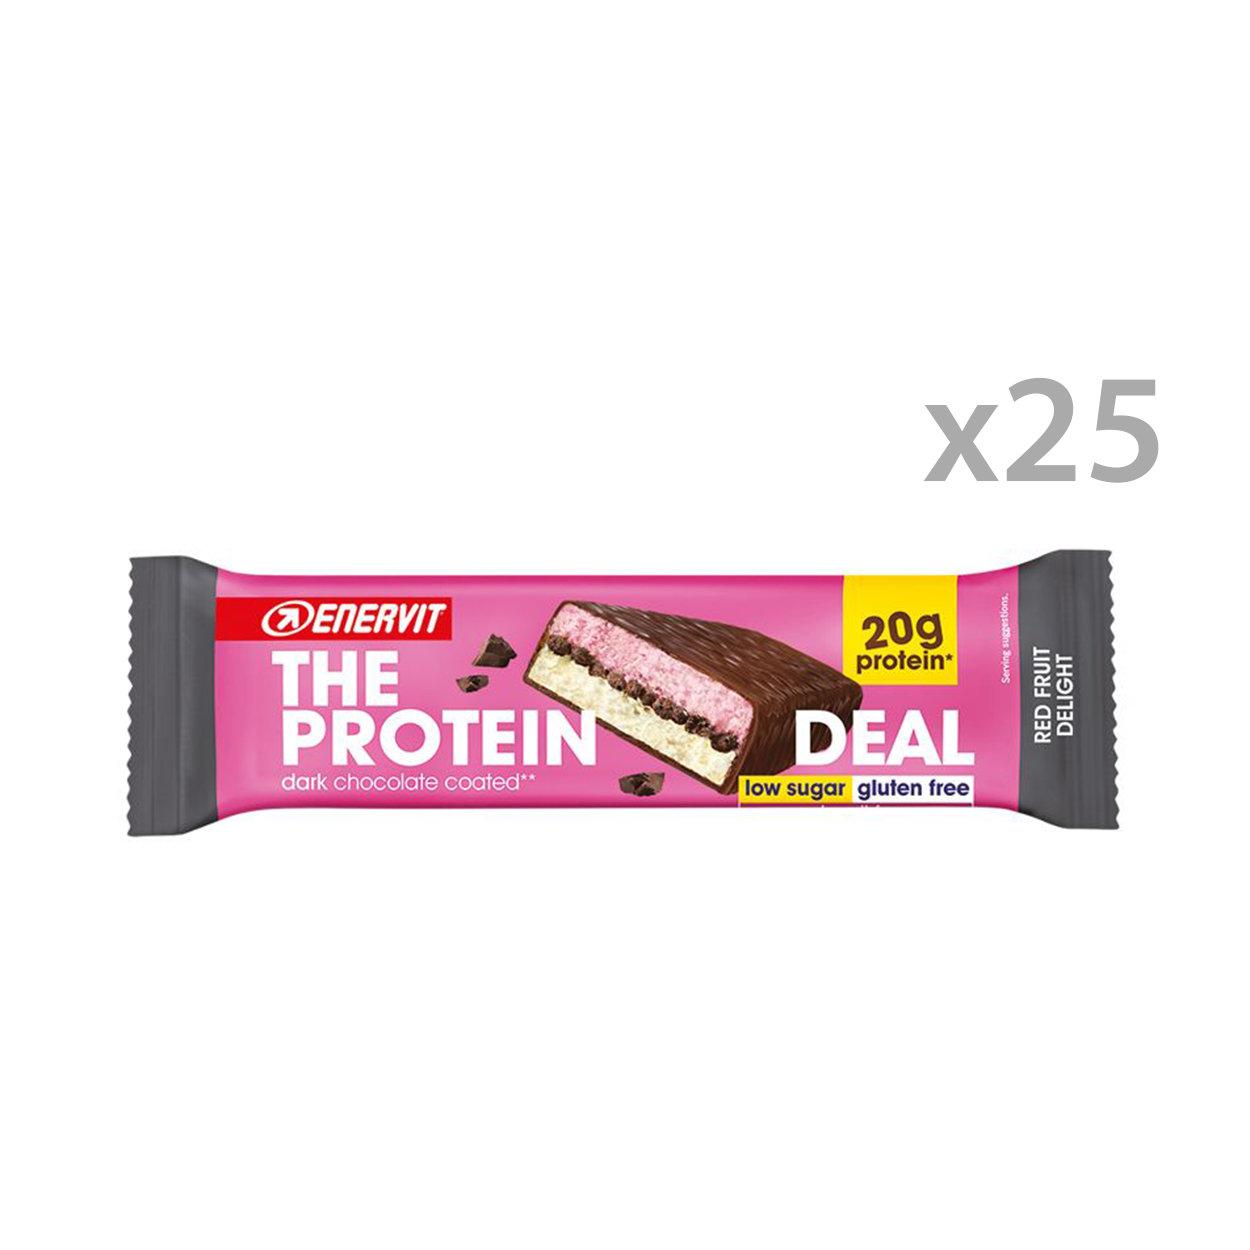 25 barrette da 55 gr - Enervit The Protein Deal Bar Frutti Rossi